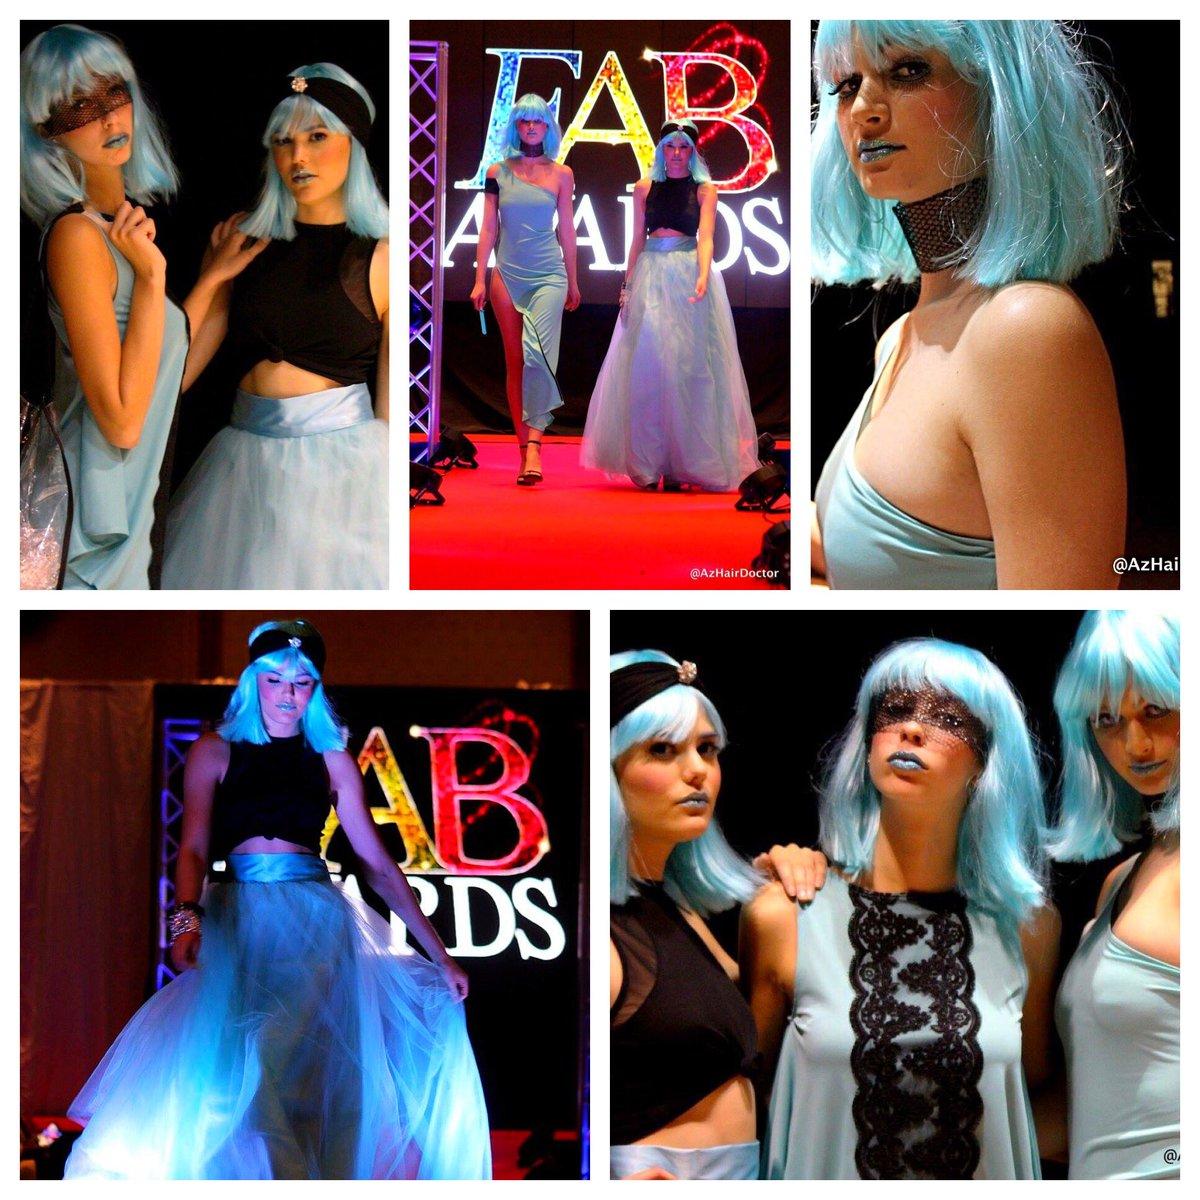 My &quot;Blueberry Babes&quot;...thx 4 lighting up the #LR runway! Photos: @AzHairDoctor Wigs: @KosmoKrisJ MUA: @makeupbyyolanda Model: @JordanP059<br>http://pic.twitter.com/i400M0BwJg